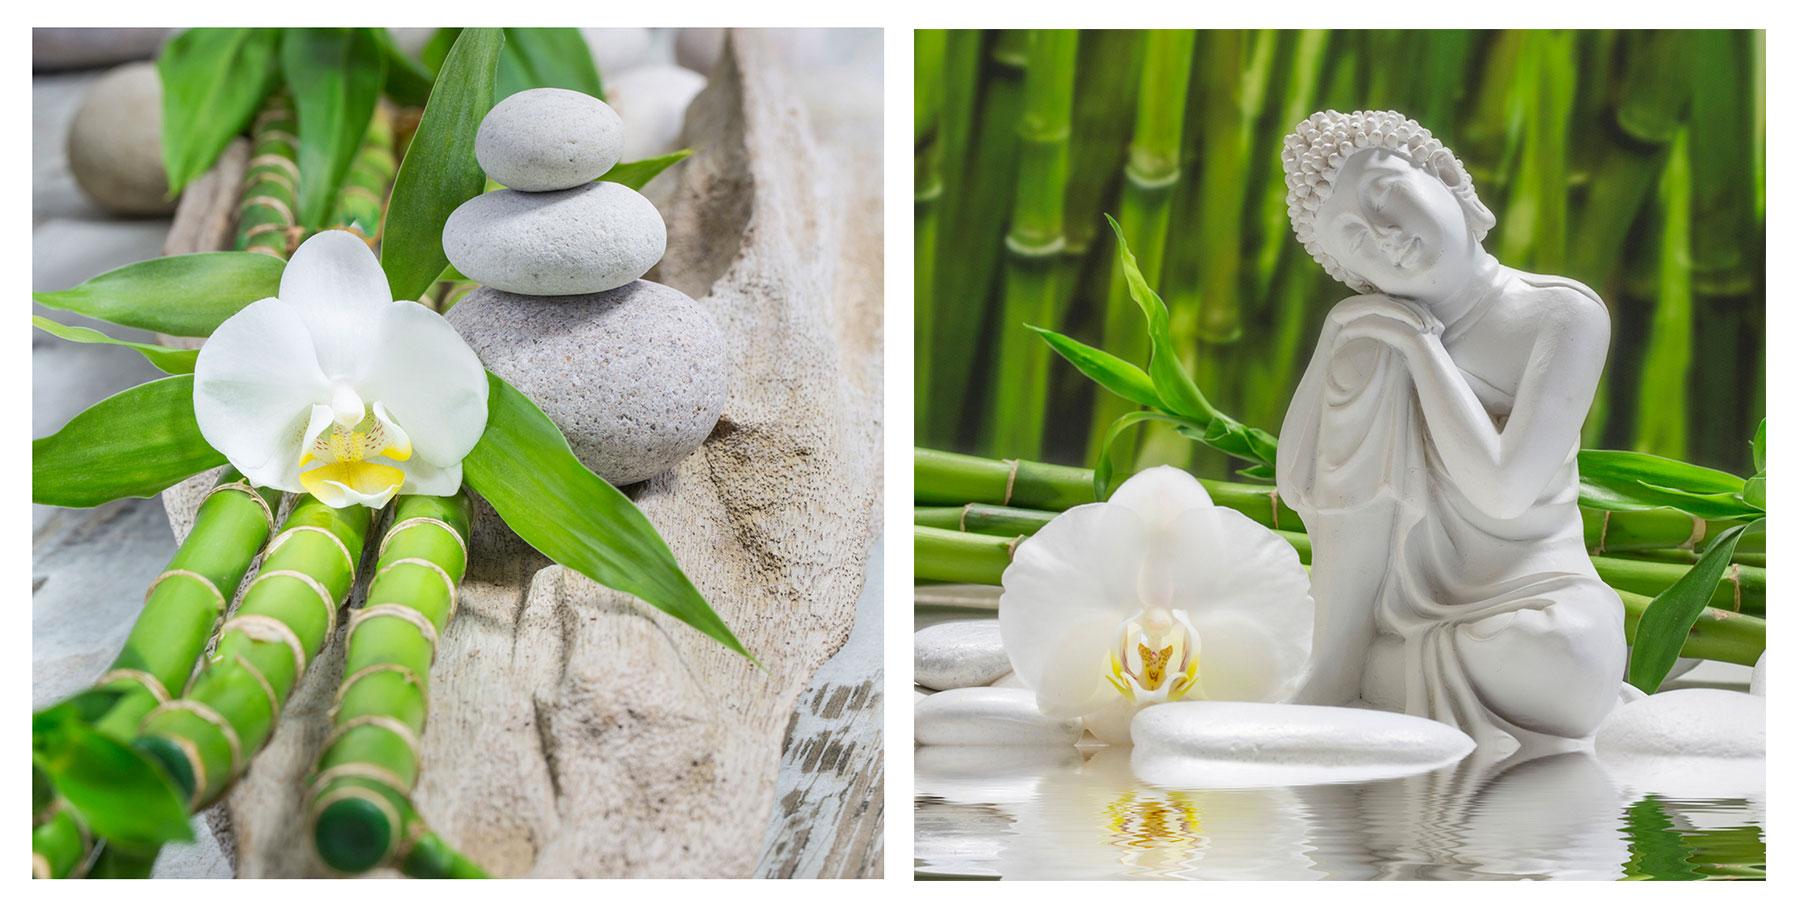 levandeo 2er set glasbild 30x30cm buddha wei e orchidee. Black Bedroom Furniture Sets. Home Design Ideas